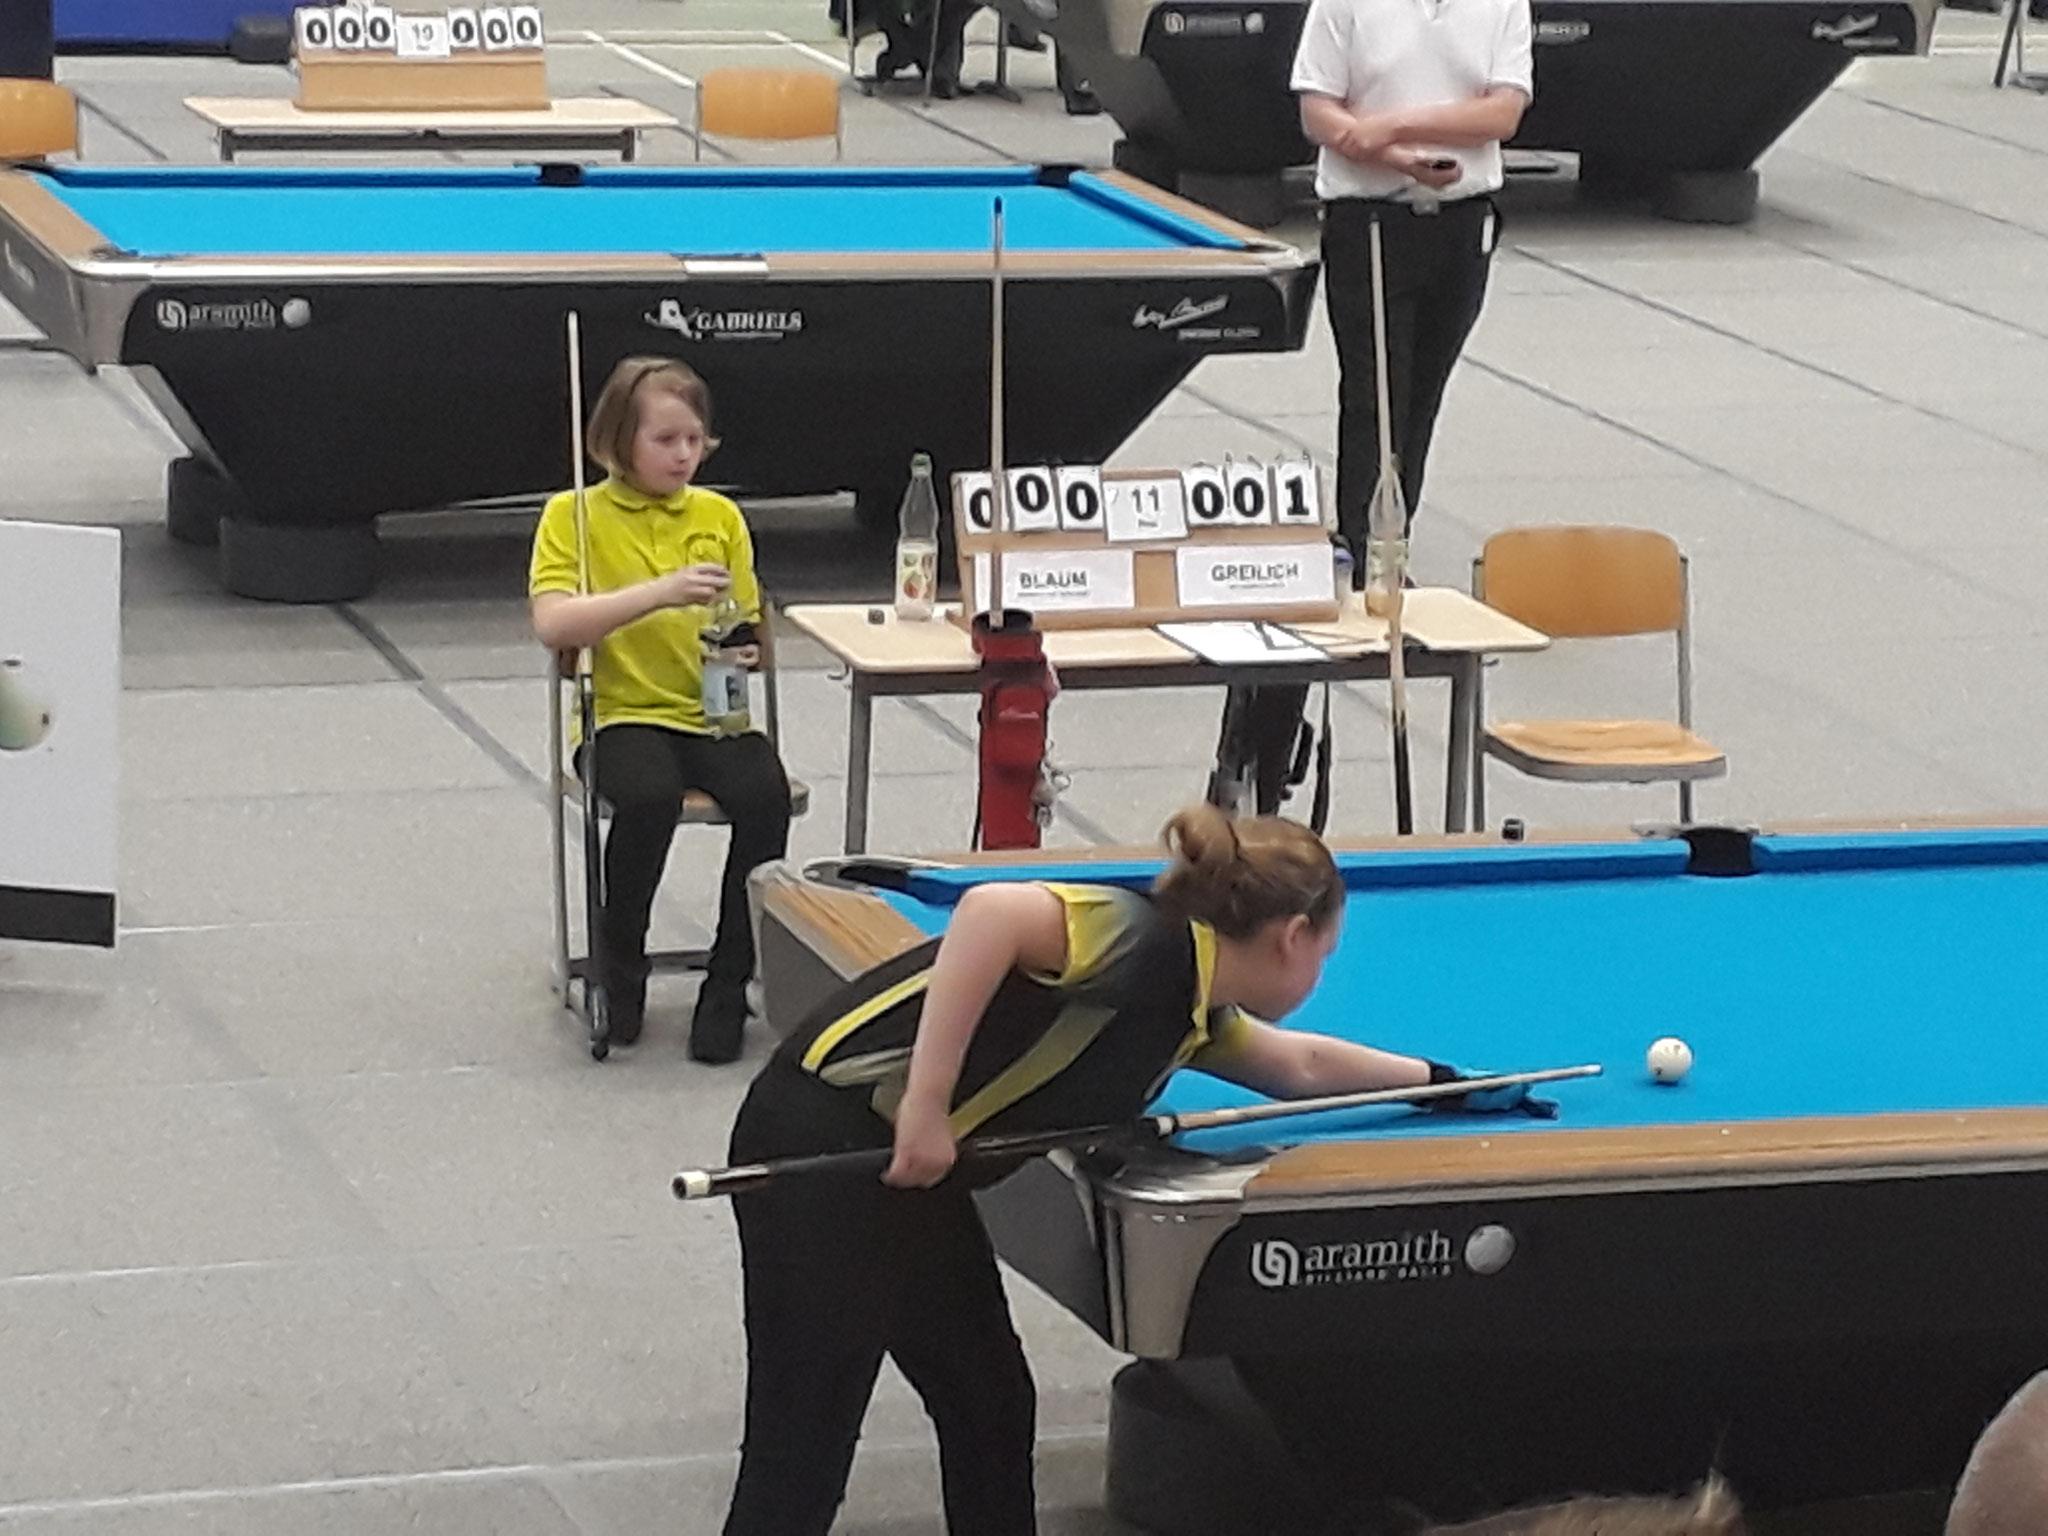 Amy Blaum gegen Hailey Freilich - Foto: Bergische Pool Union